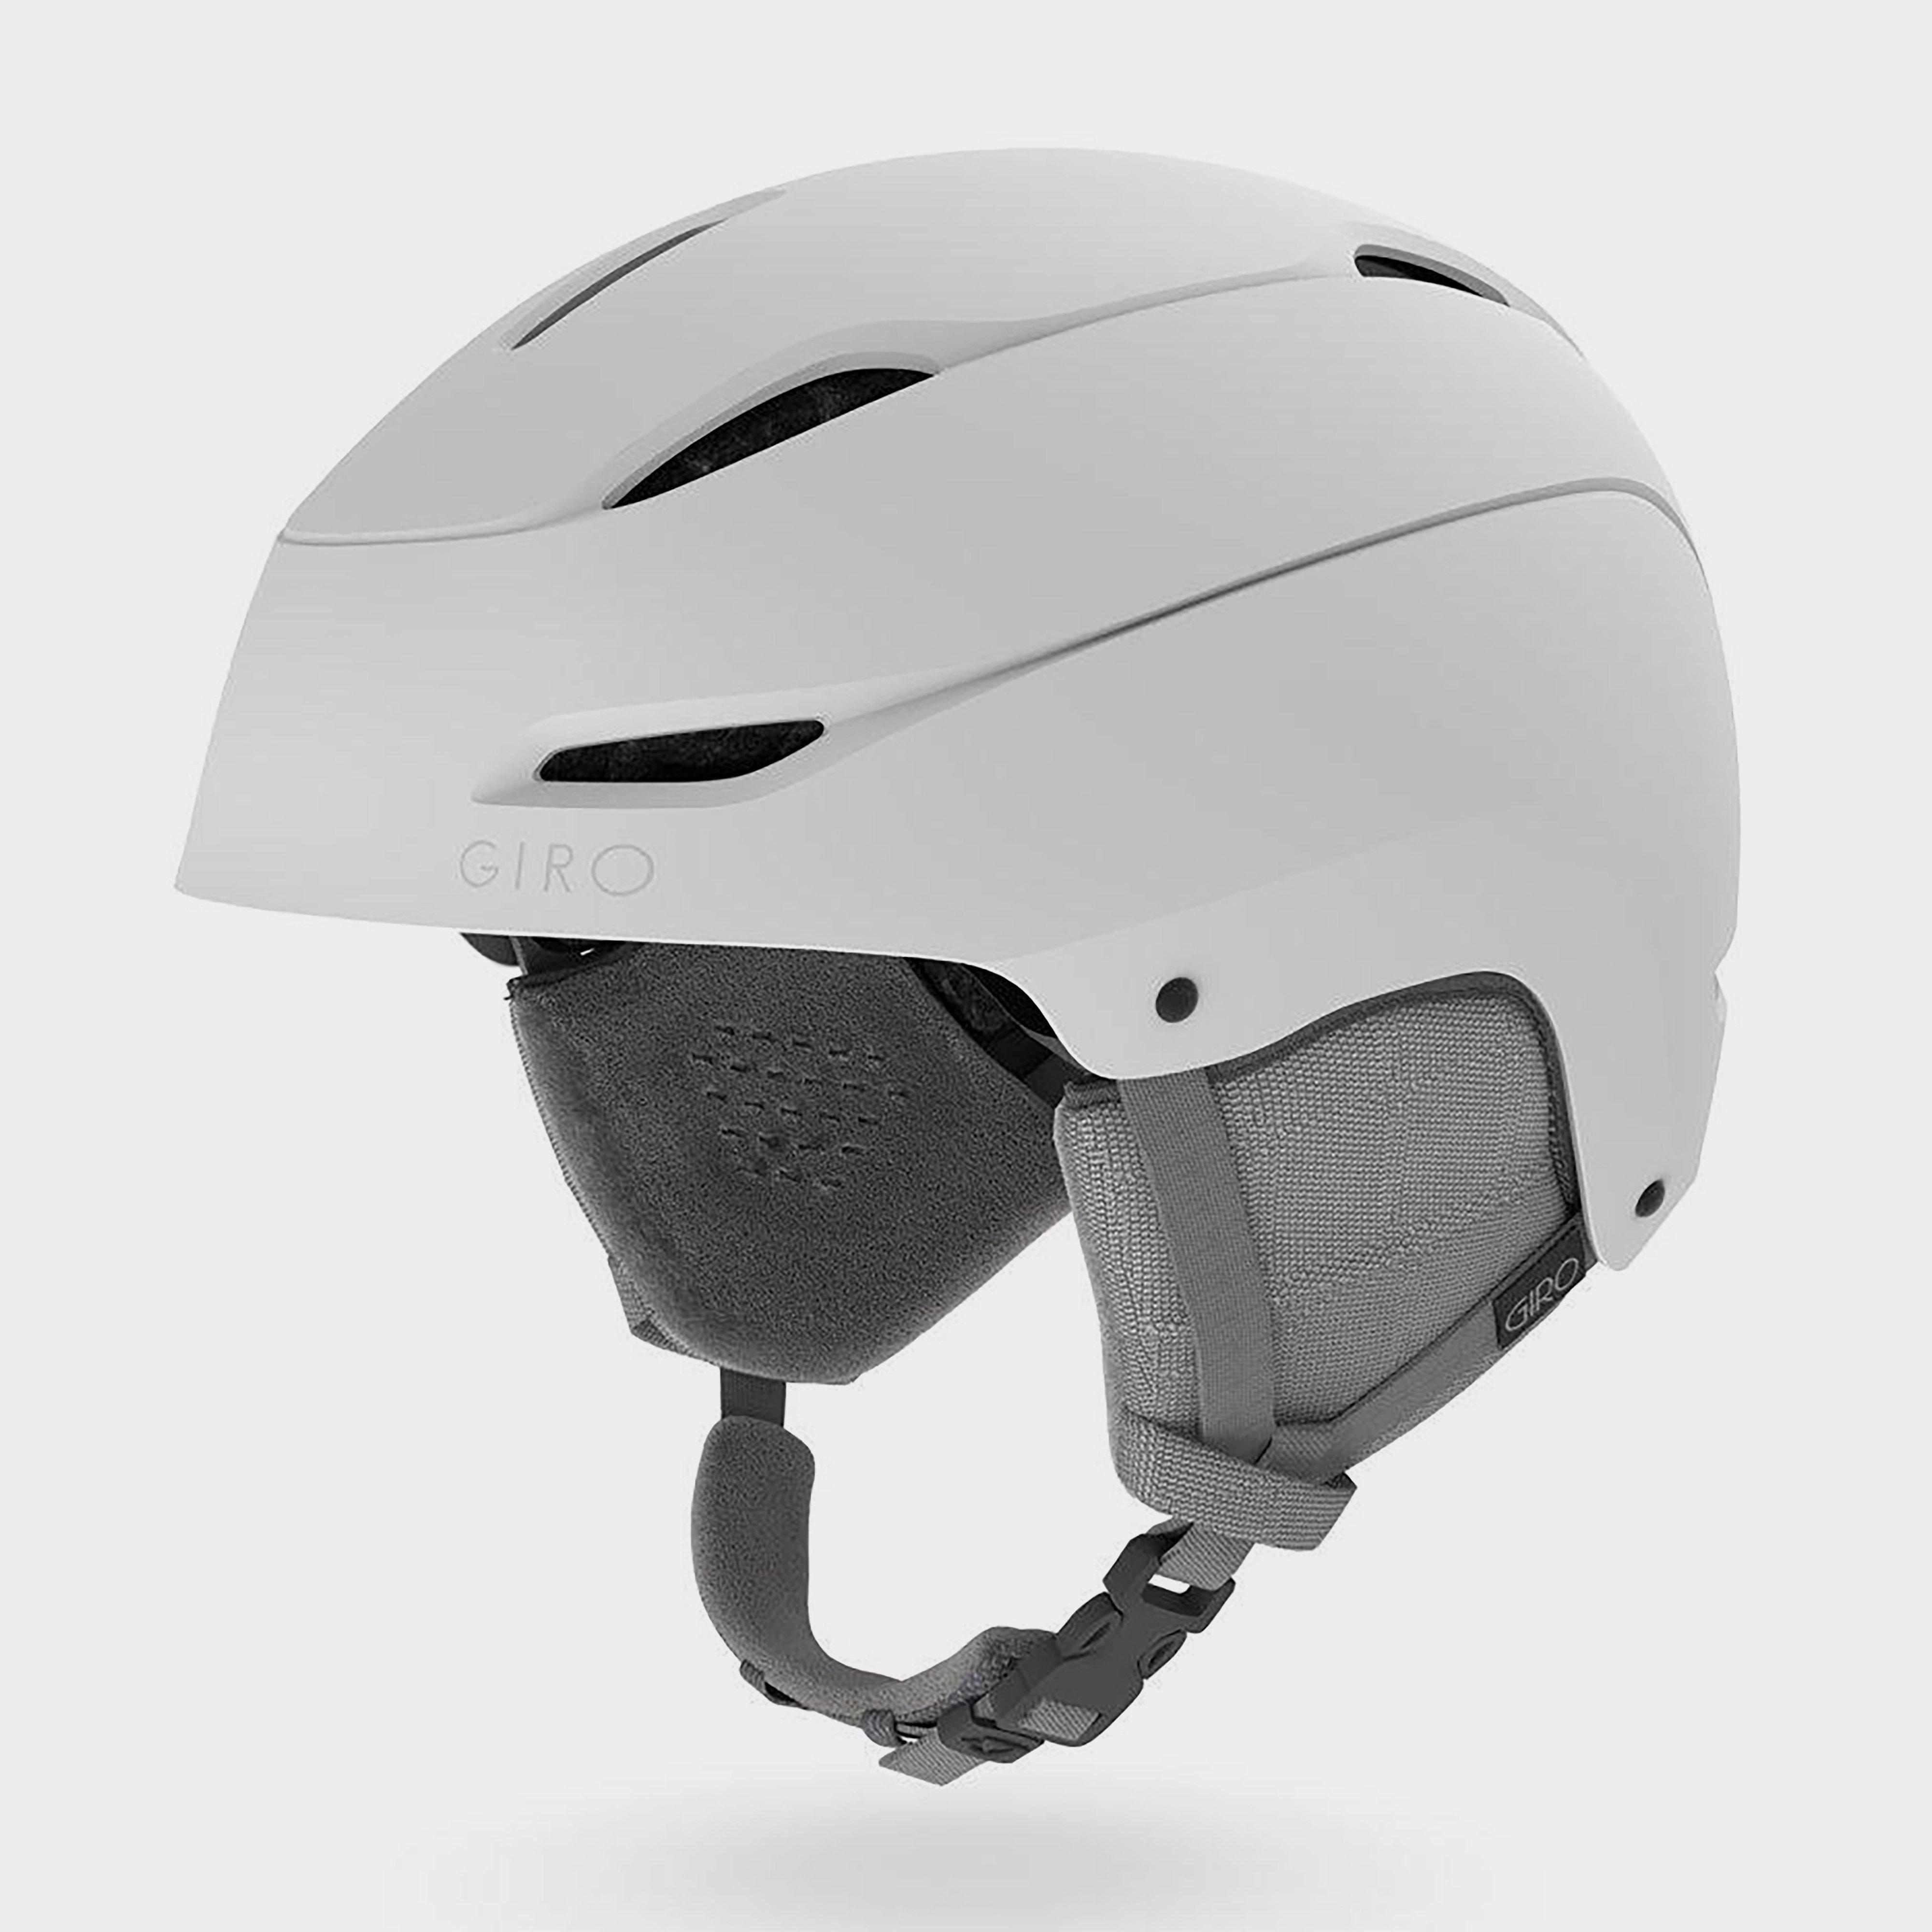 Giro Women's Ceva Snow Helmet - Grey/Wht, Grey